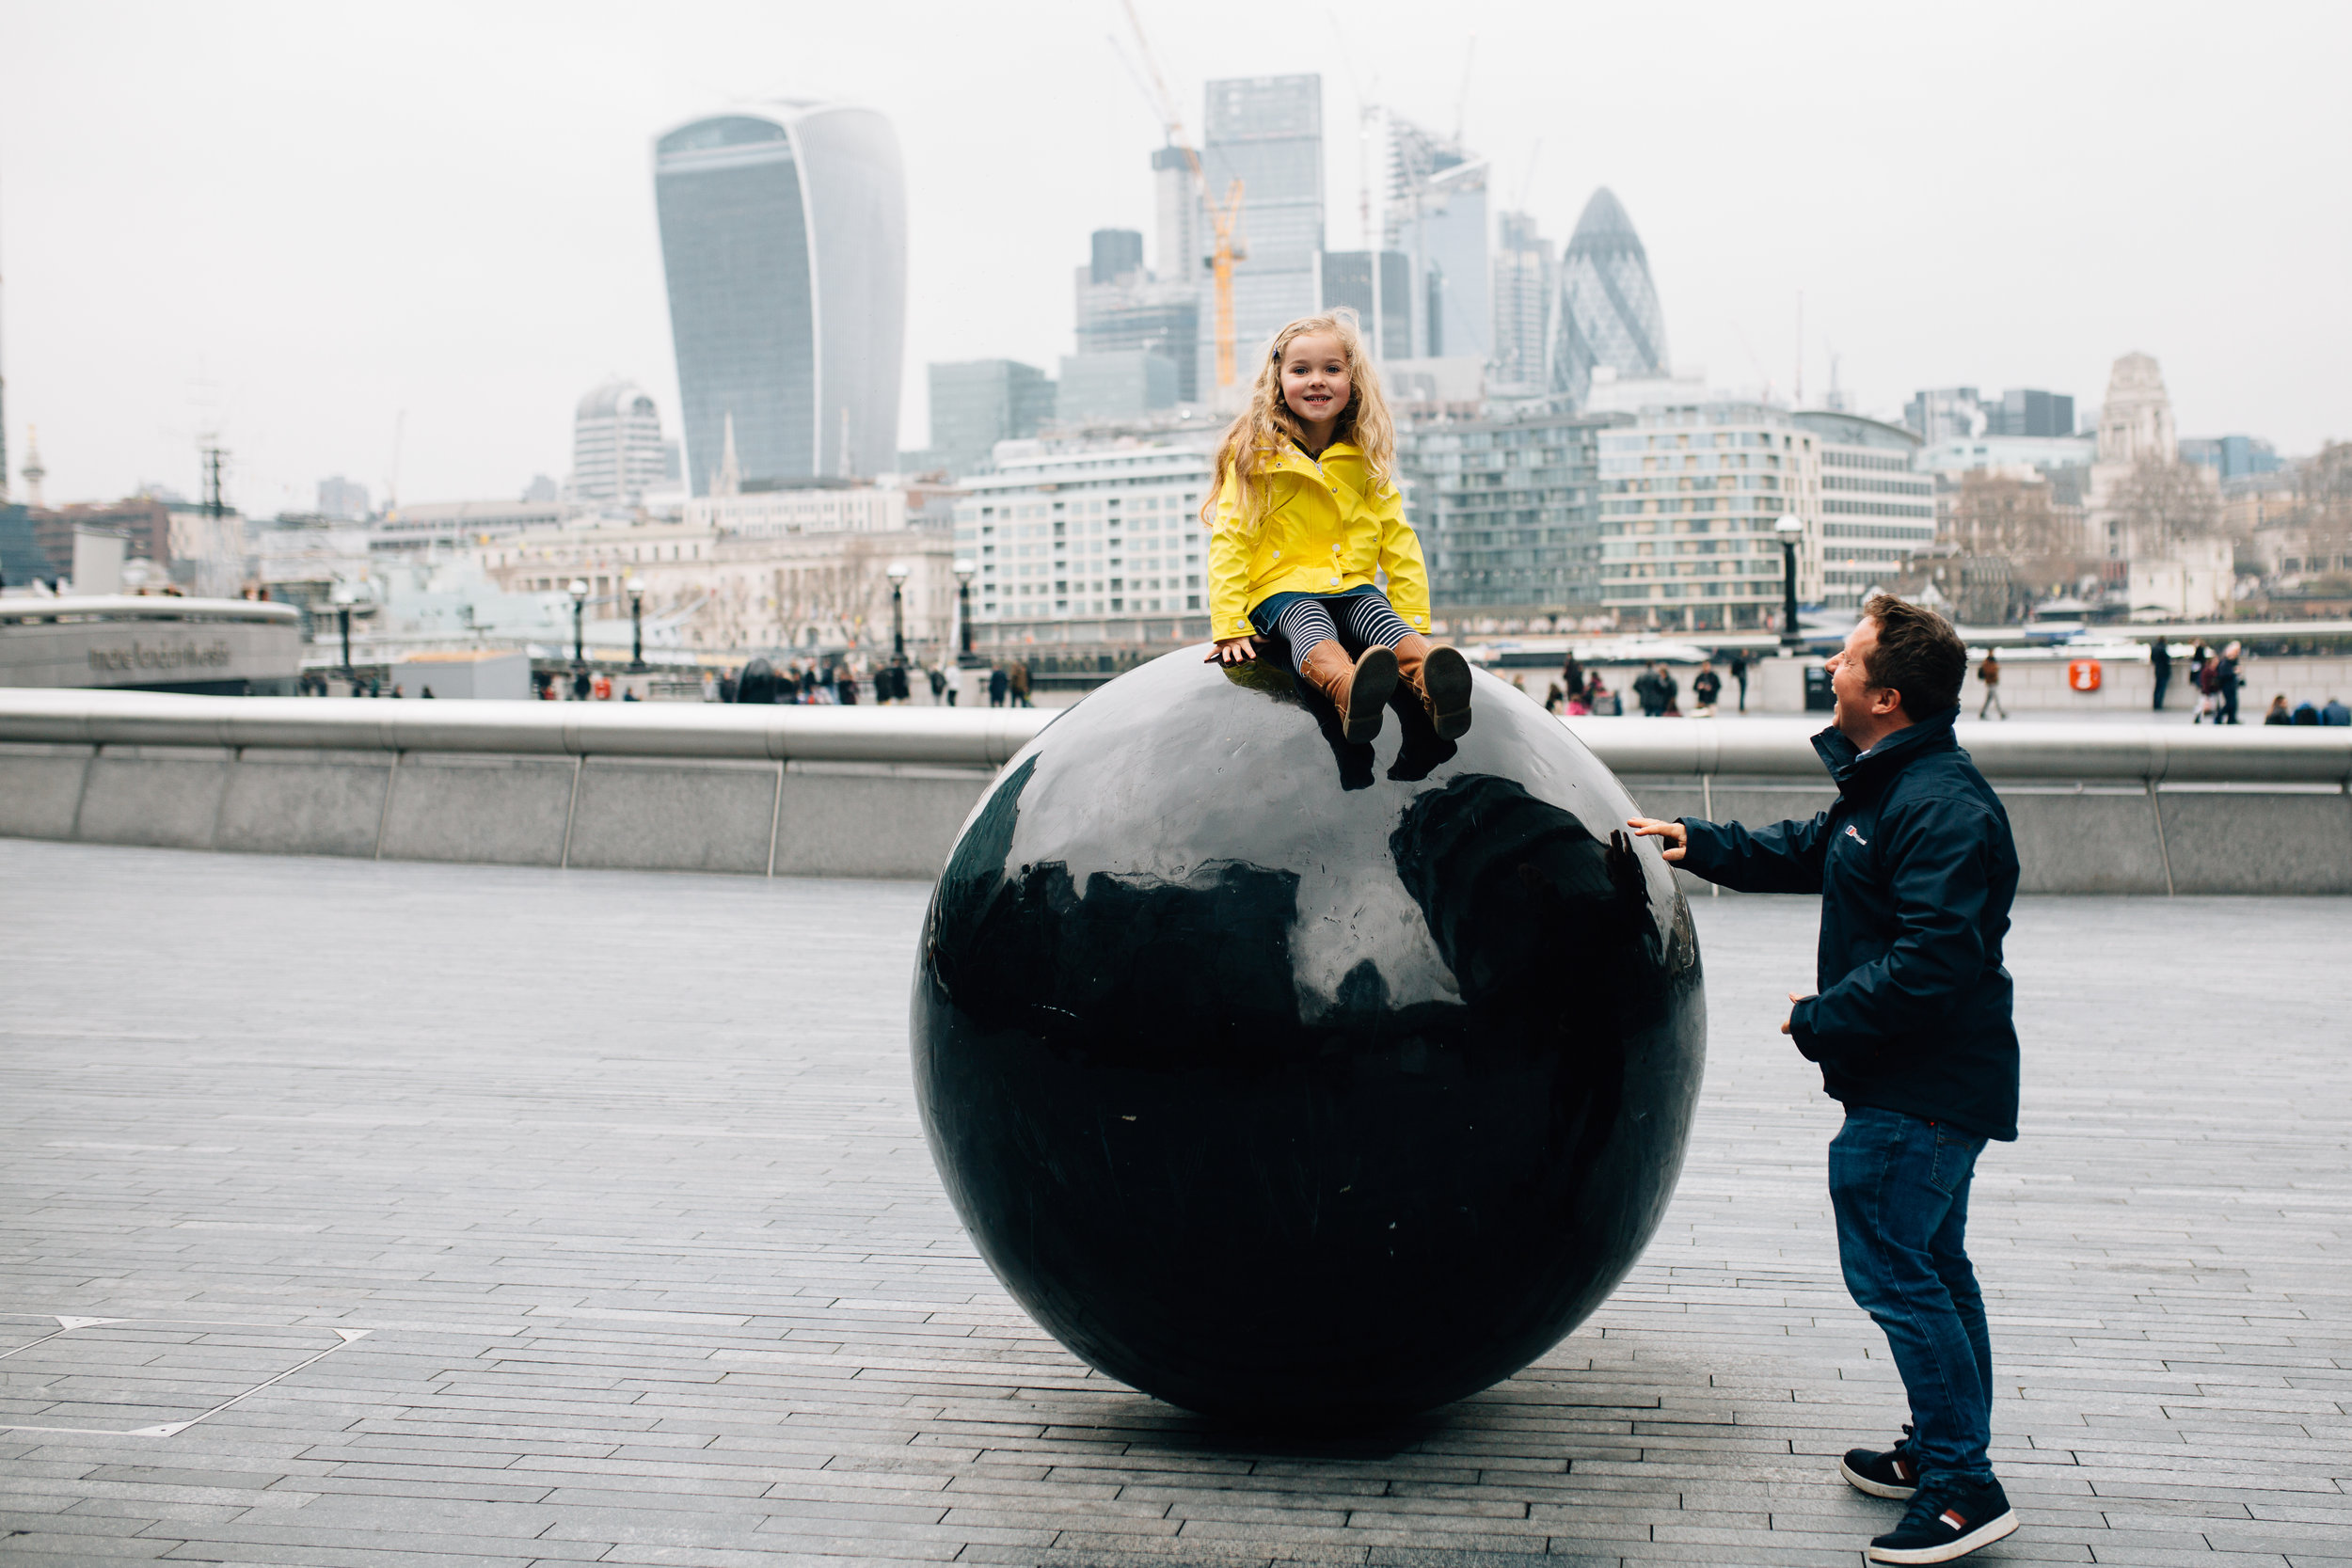 Girl on sculpture London City Photographer